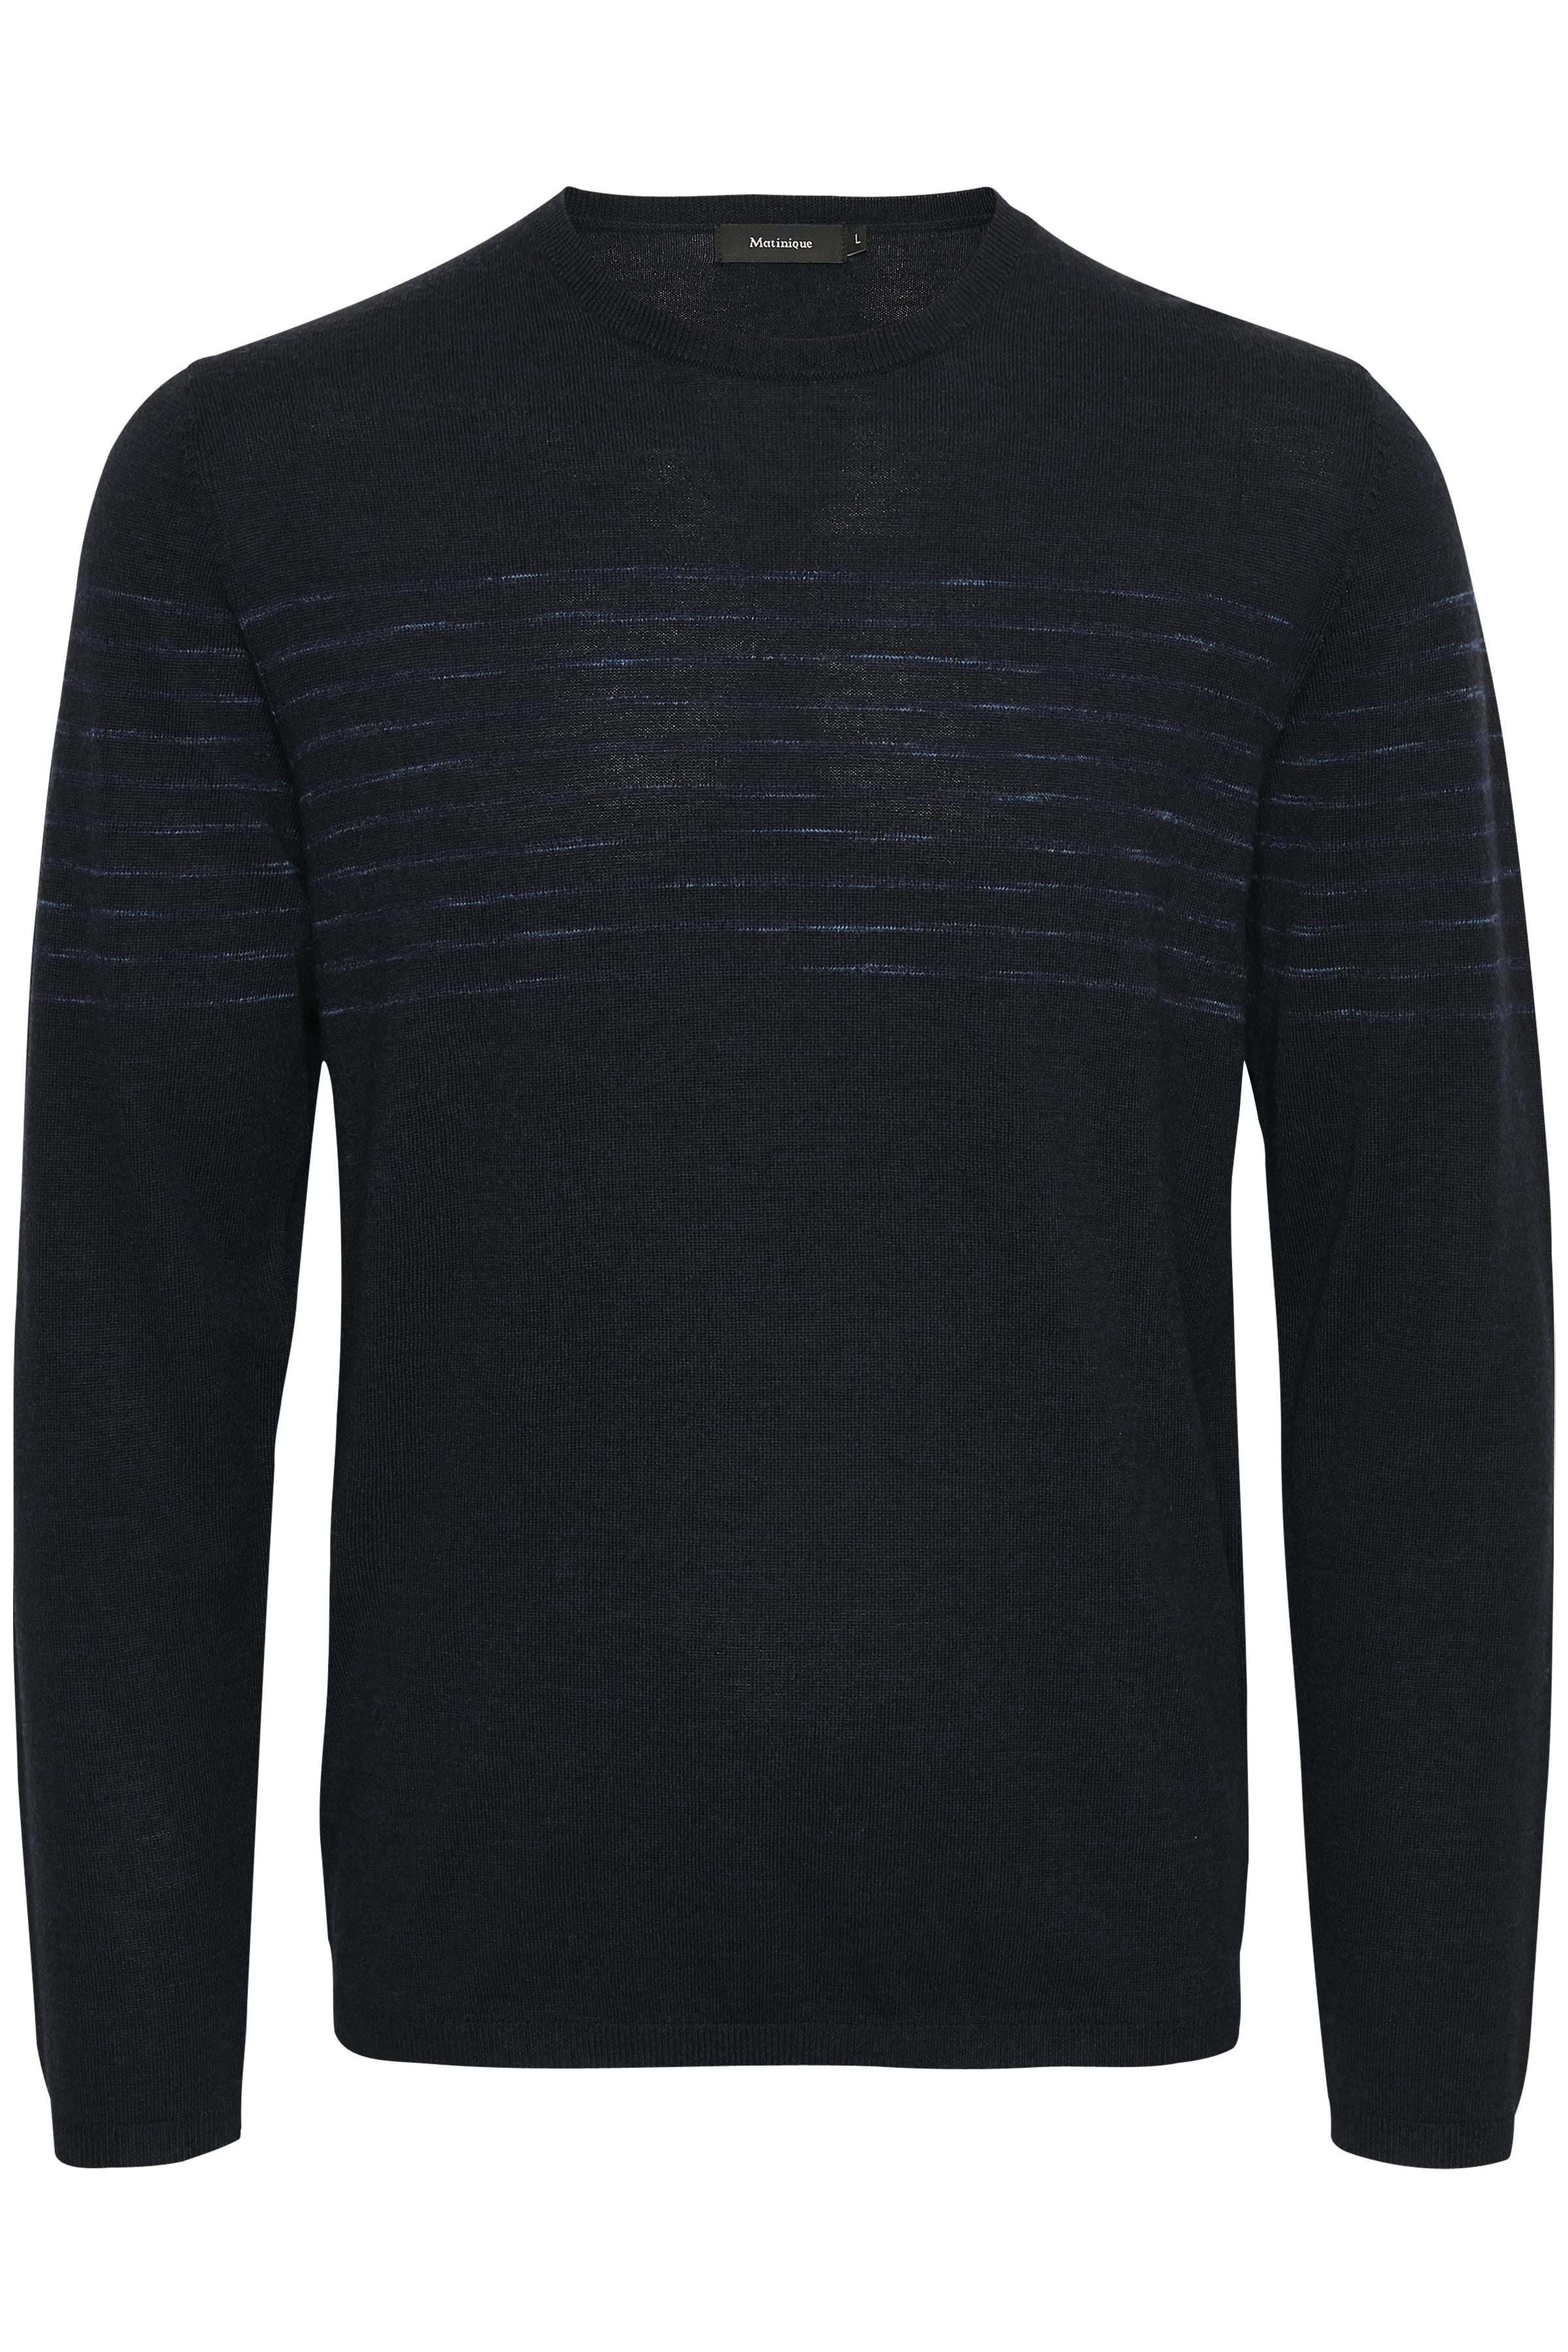 Pattern Akio Pullover – Køb Pattern Akio Pullover fra str. S-XXL her